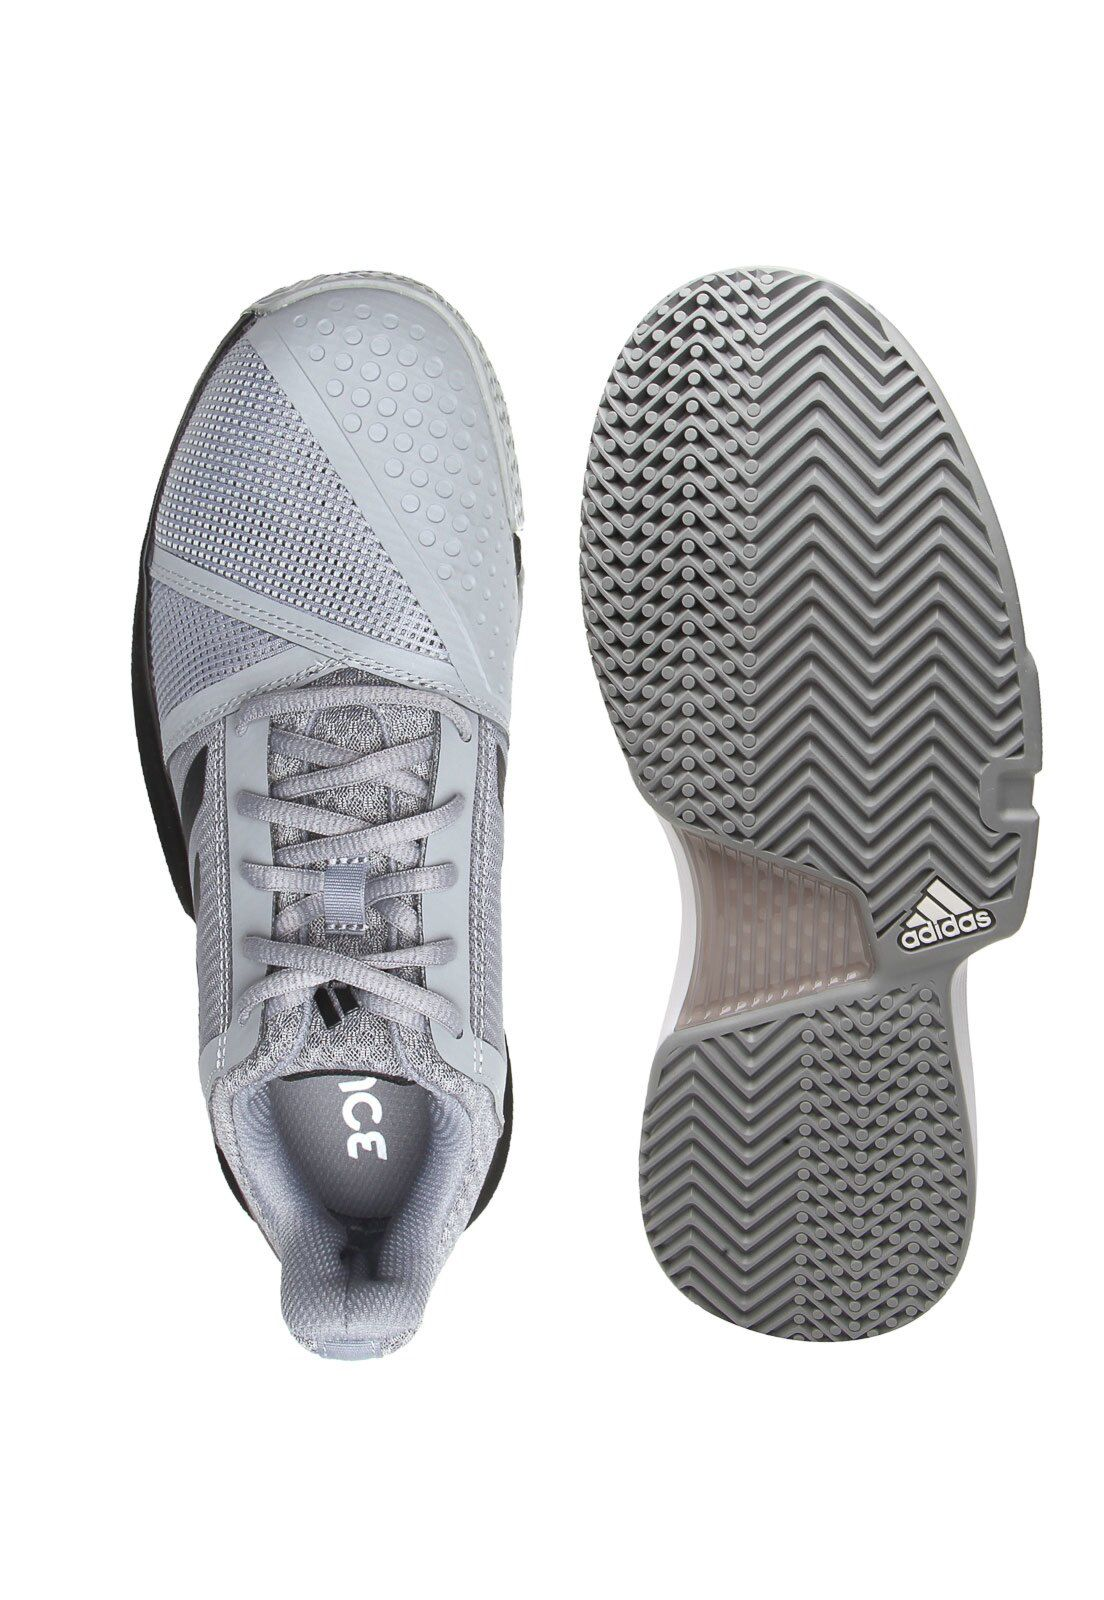 Tênis Courtjam Bounce Adidas - Cinza